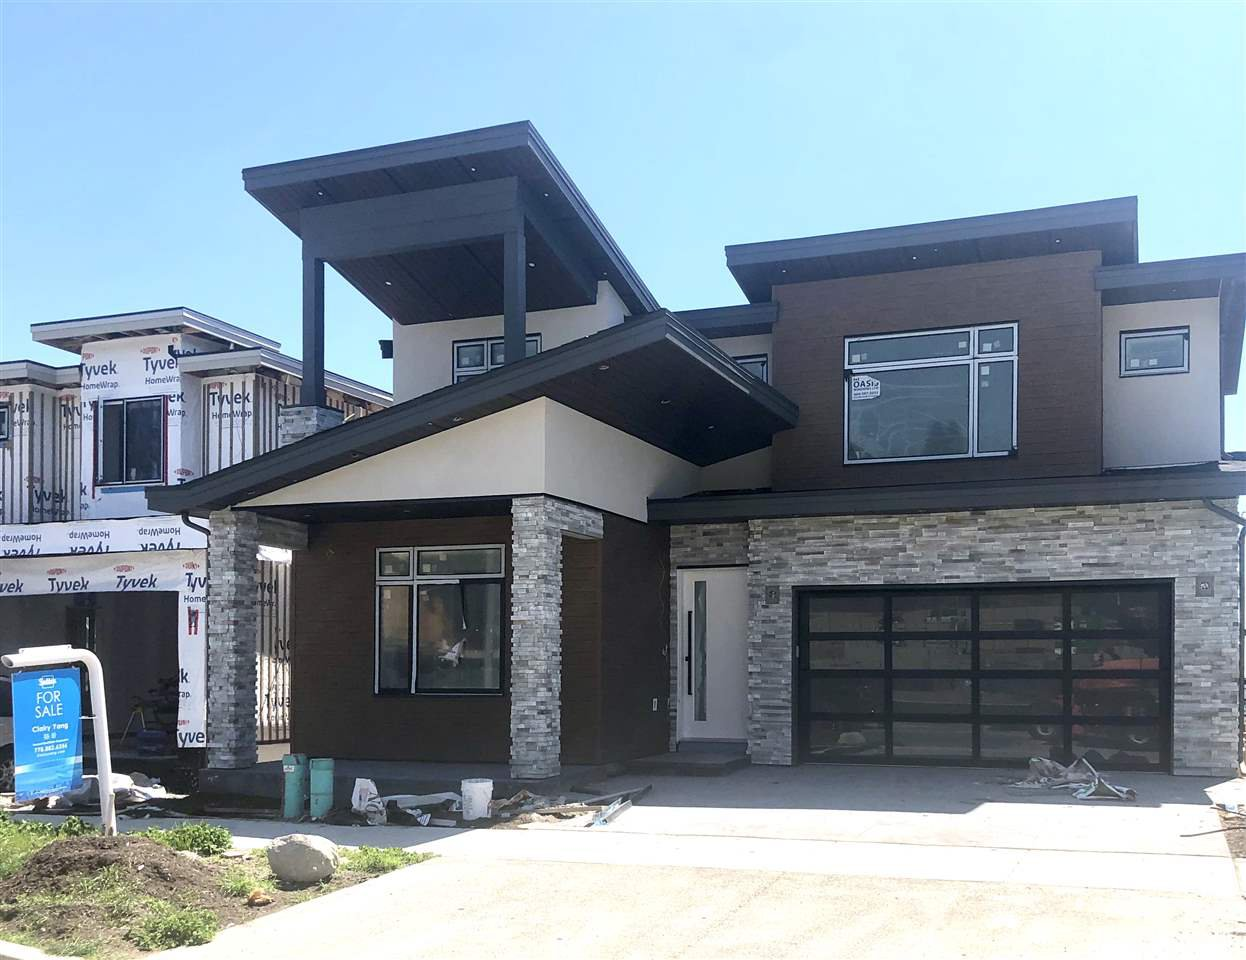 Main Photo: 16688 19TH Avenue in White Rock: Pacific Douglas House for sale (South Surrey White Rock)  : MLS®# R2438658